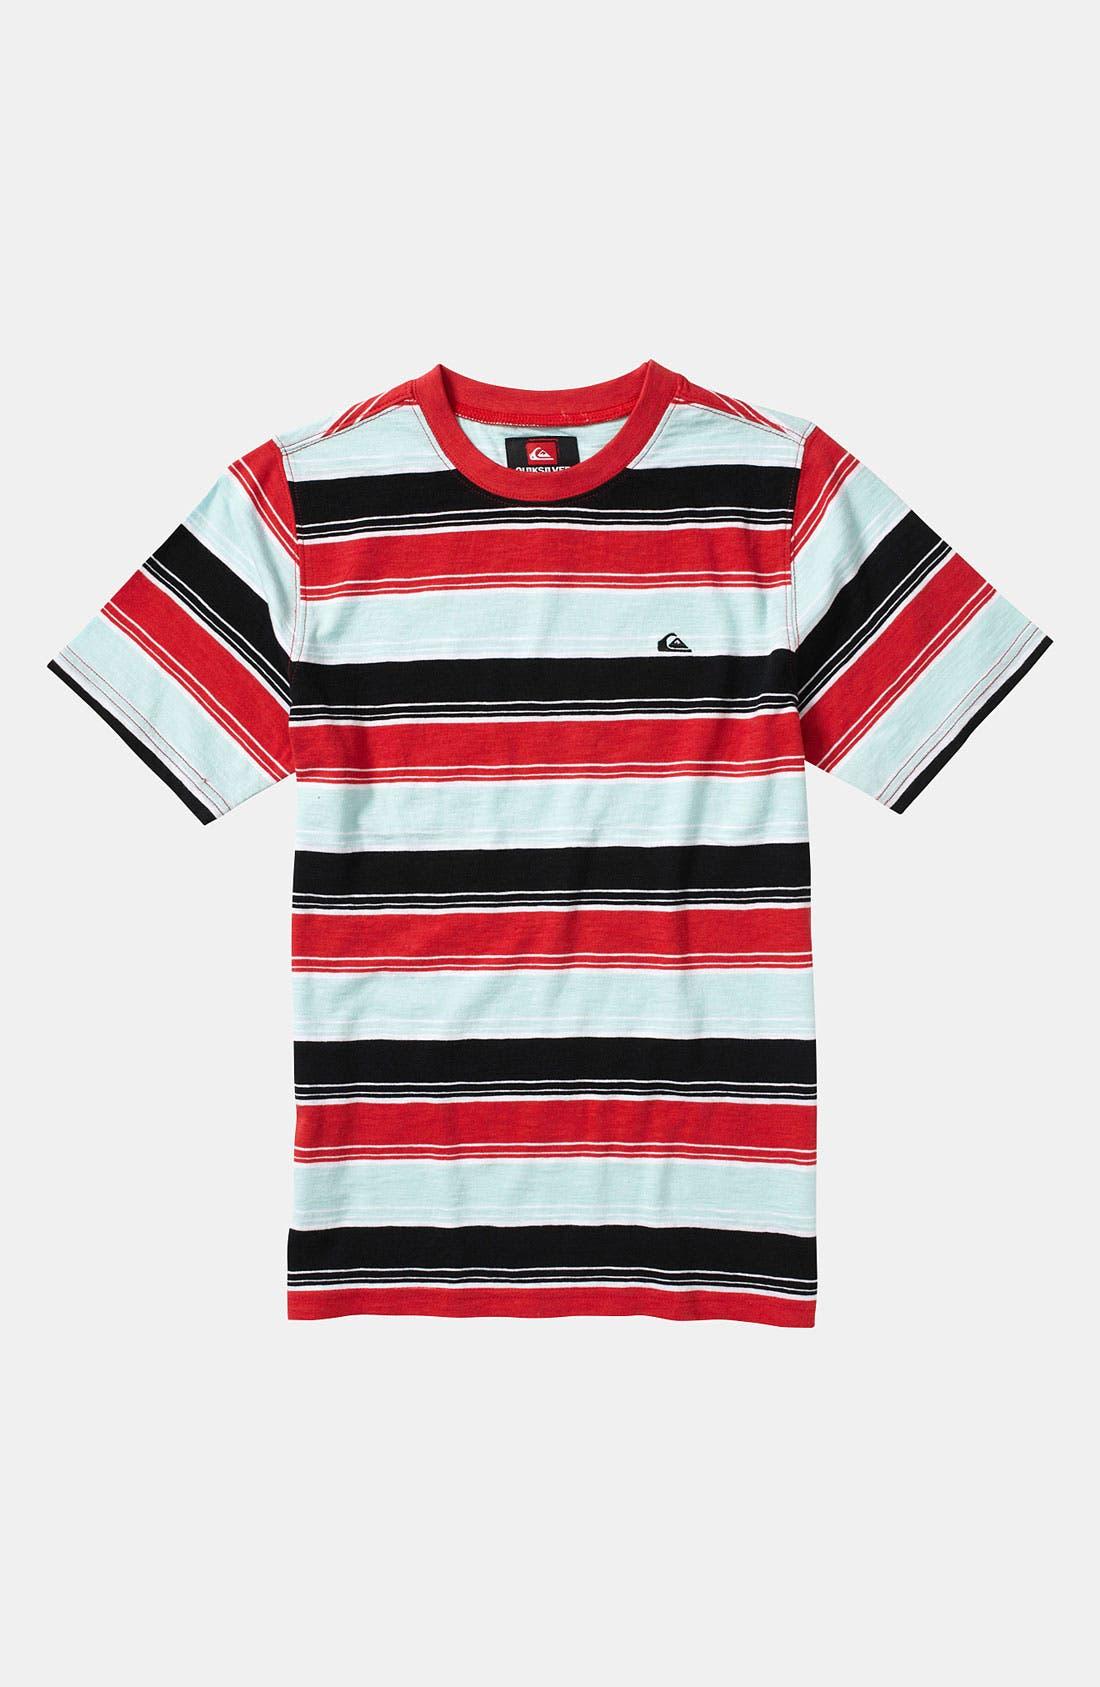 Main Image - Quiksilver 'Downside' T-Shirt (Little Boys)